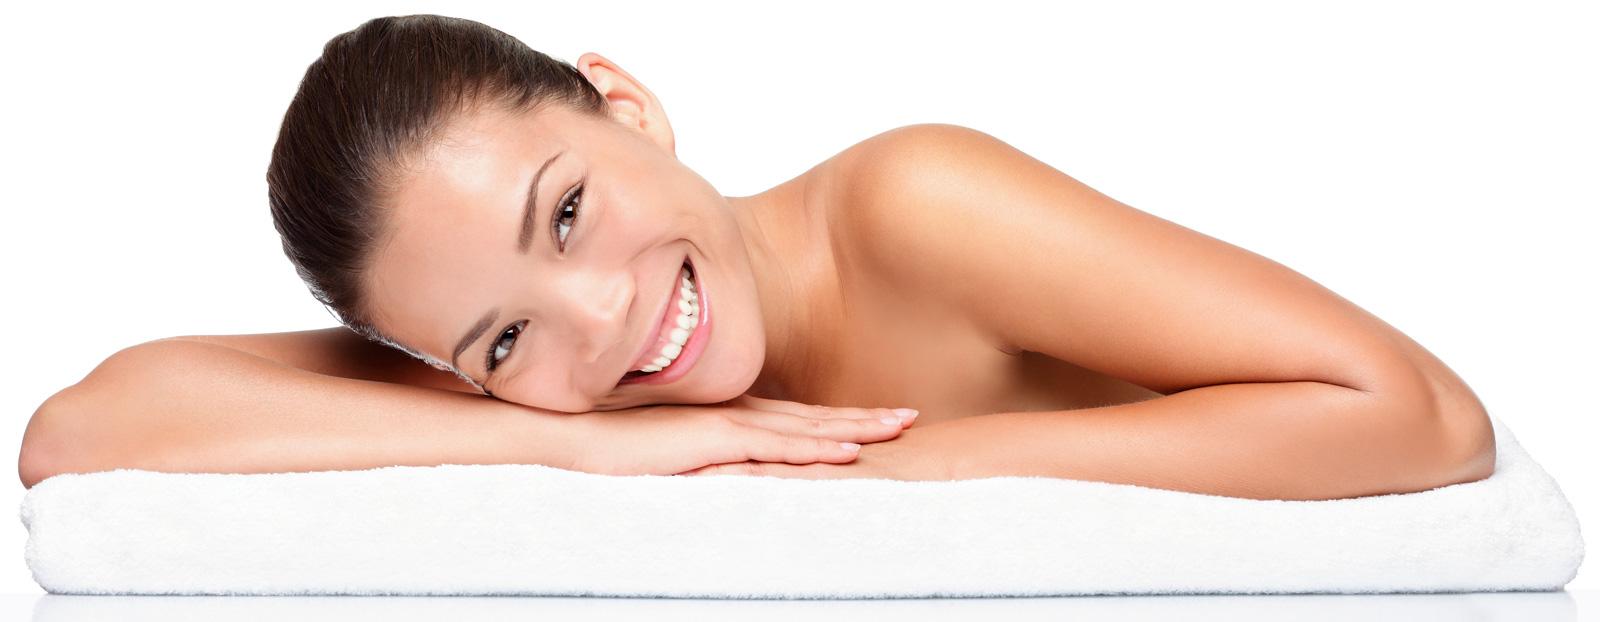 model on towel smiling